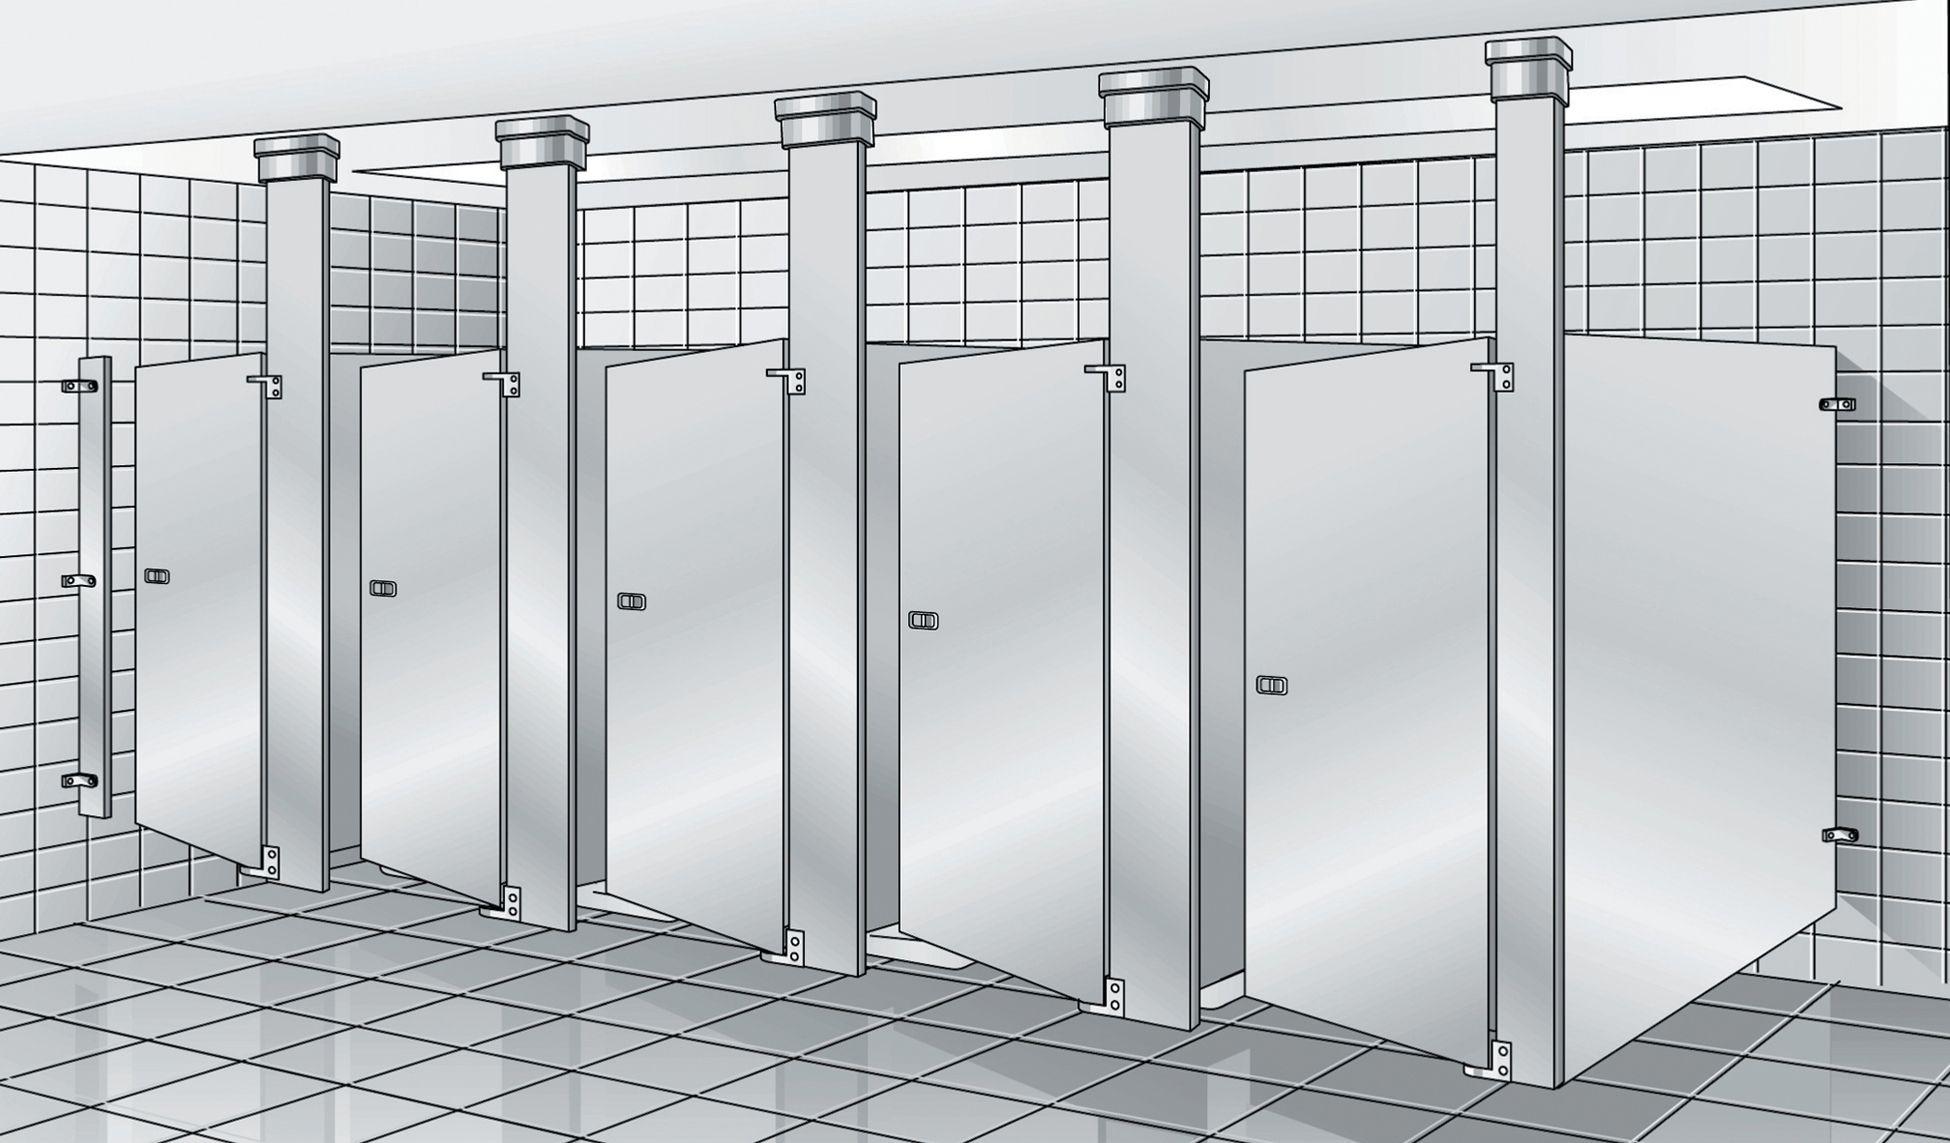 Bathroom Stalls Revit bradley revit toilet partition family | instruction sheet-revit